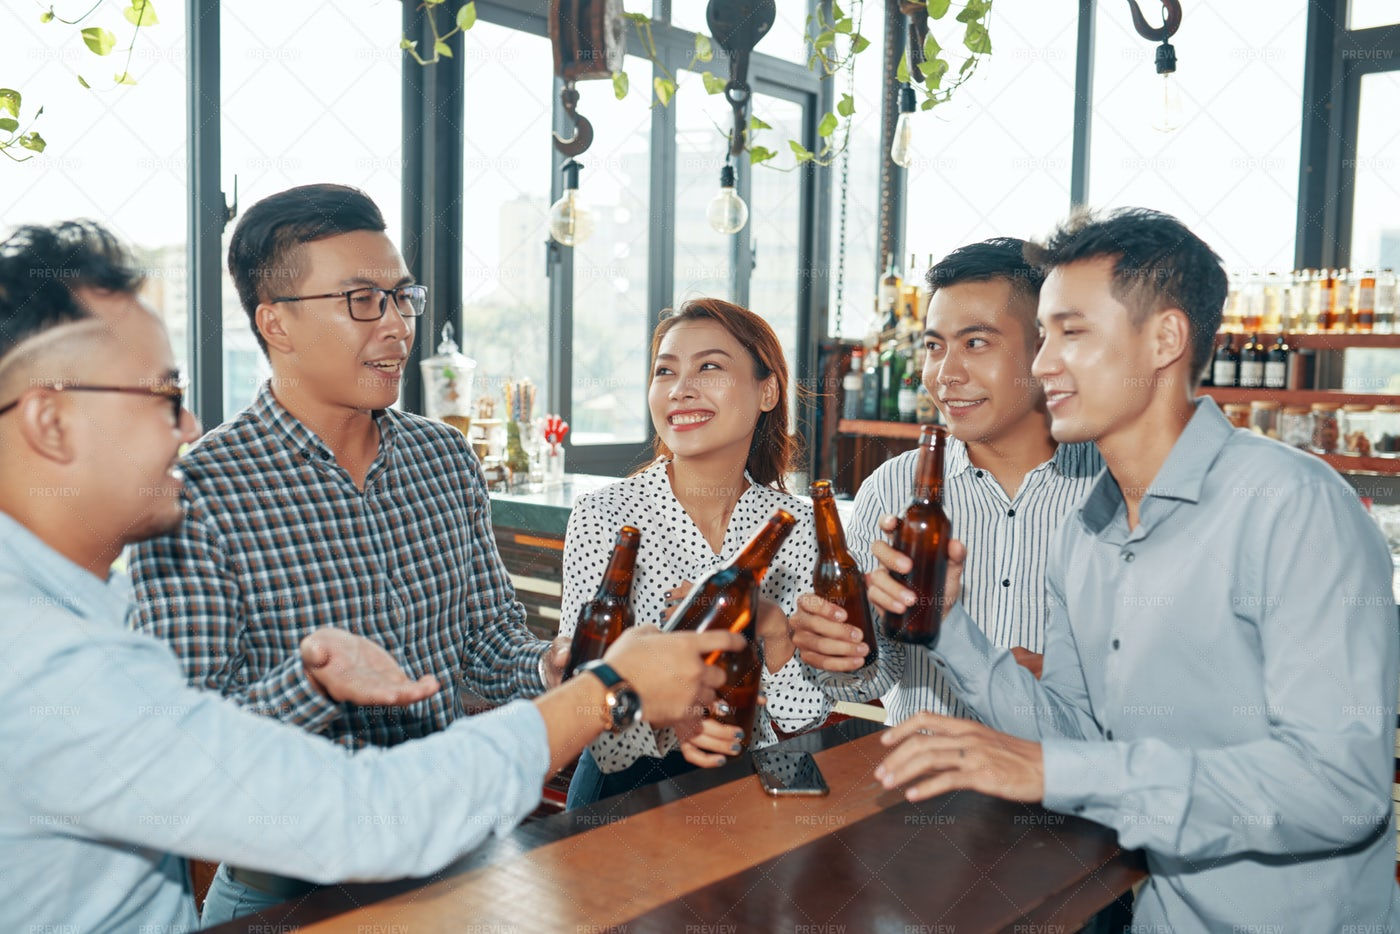 Business People Having Fun In The Bar: Stock Photos